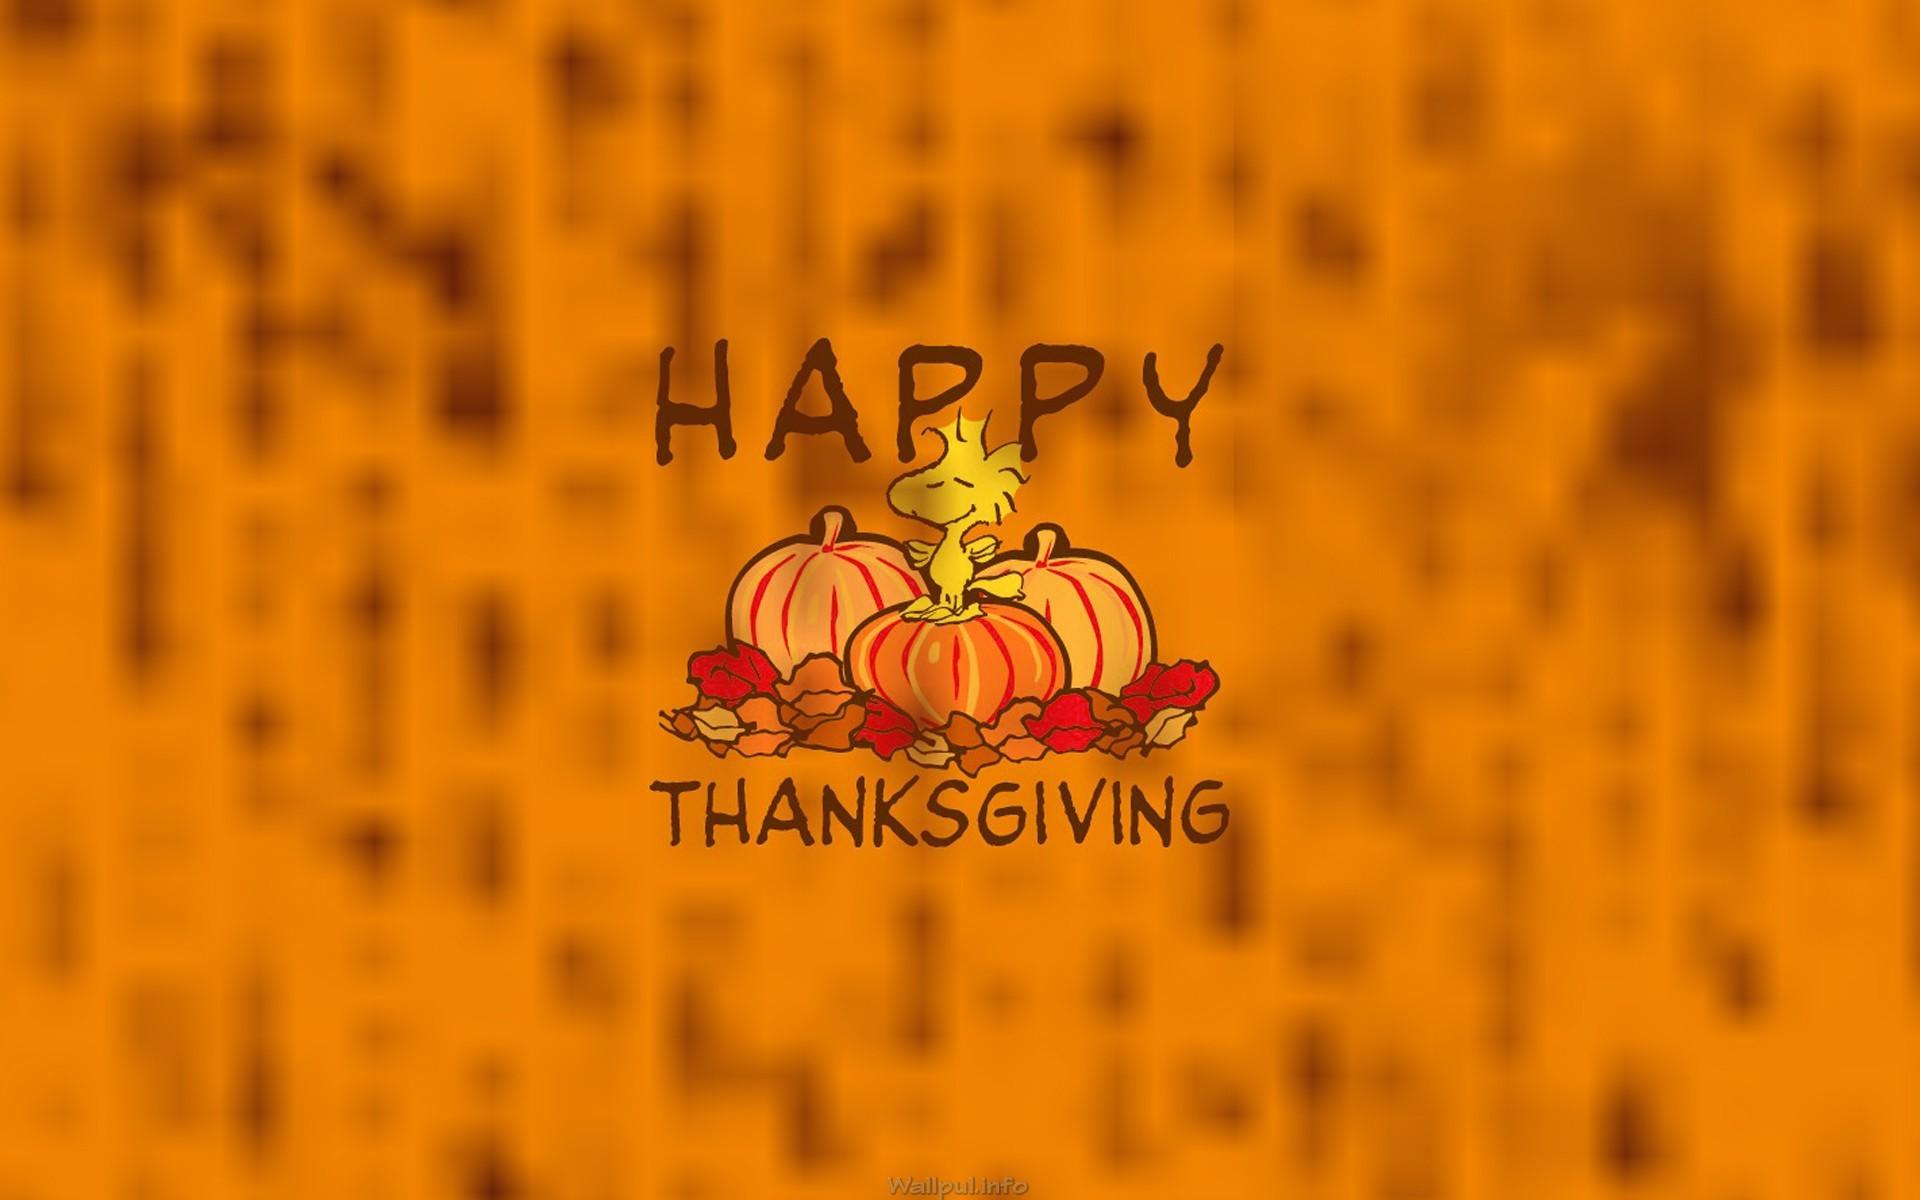 Celebration Thanksgiving Wallpaper 1080p …